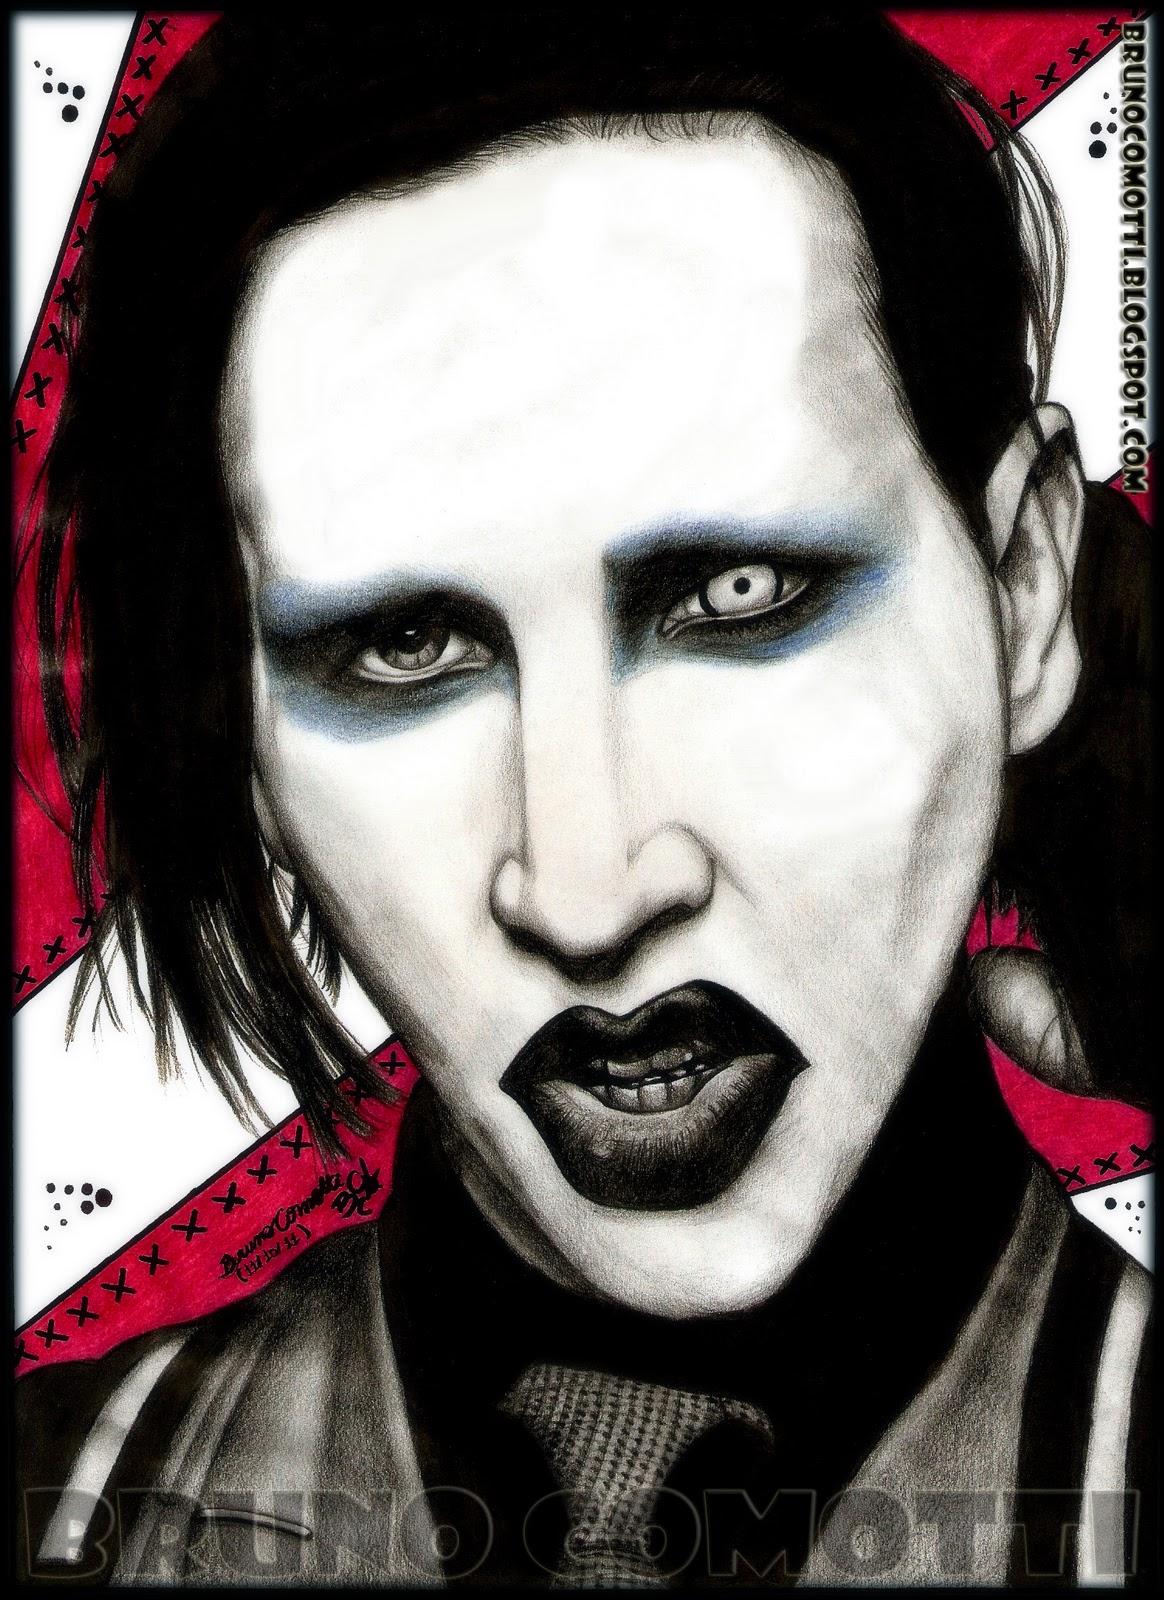 http://3.bp.blogspot.com/-fPUwesYmGuk/TpUVrmmDw3I/AAAAAAAAD4M/ma6ldLxRUi4/s1600/Retrato+Marilyn+Manson+by+Bruno+Comotti+03.jpg